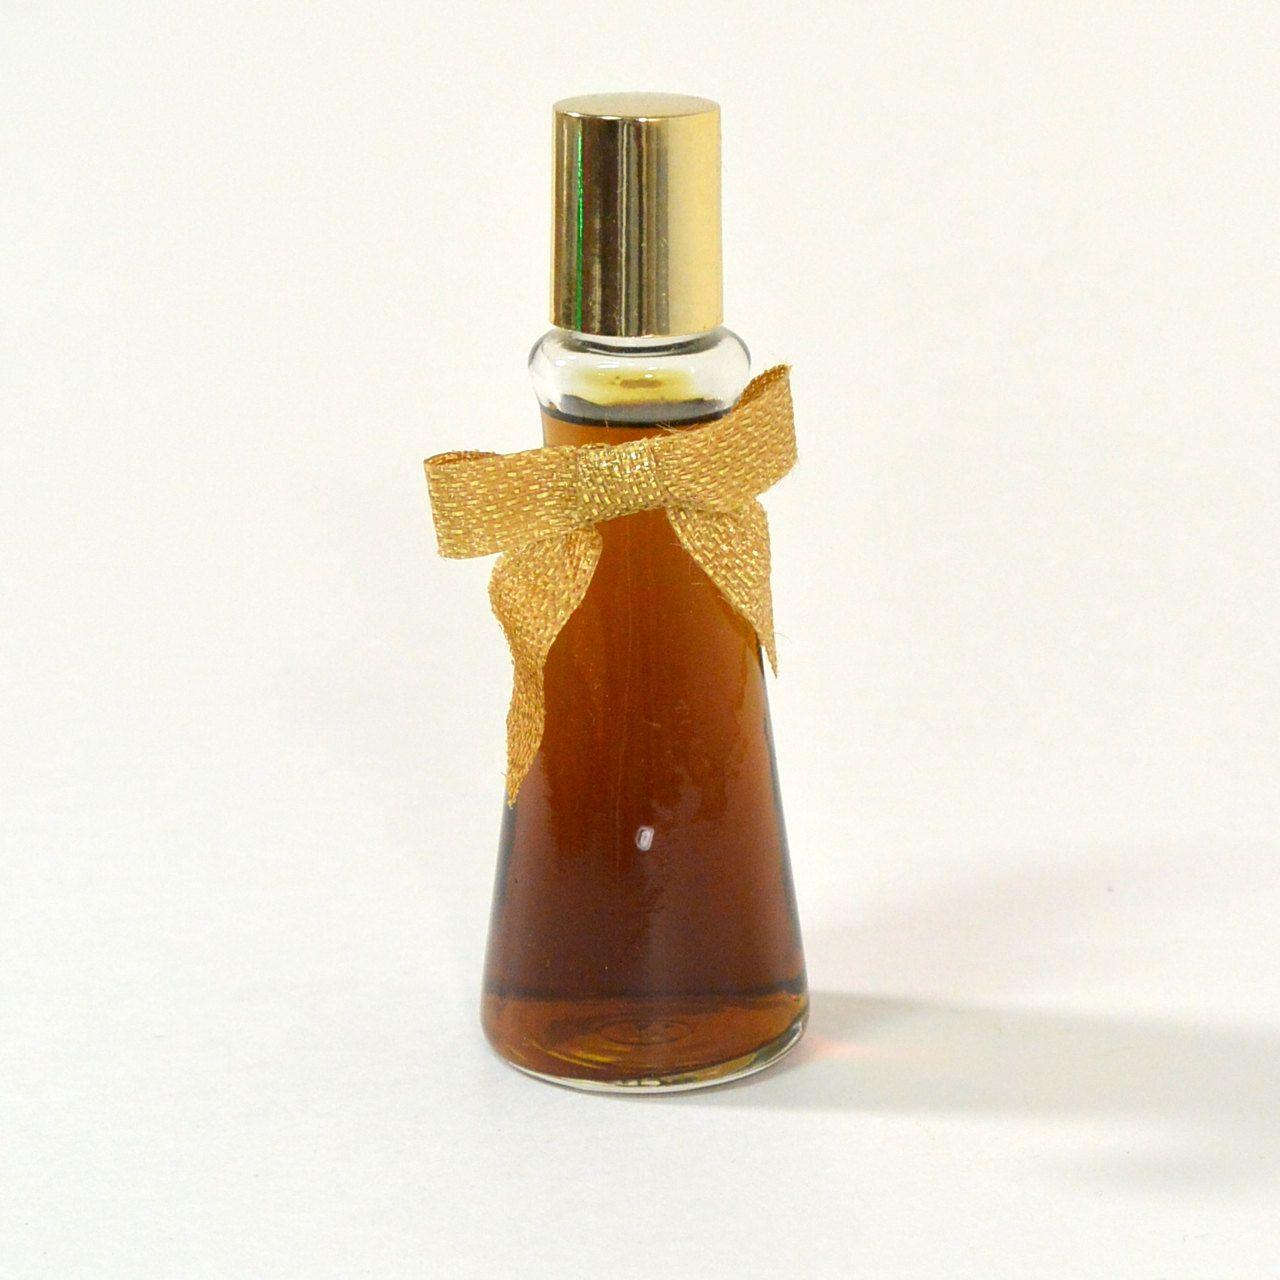 Vintage 1960s Estee By Estee Lauder Edp Eau De Perfume Splash Bottle 1 Oz Very Rare Perfume Perfume Bottles Bottle